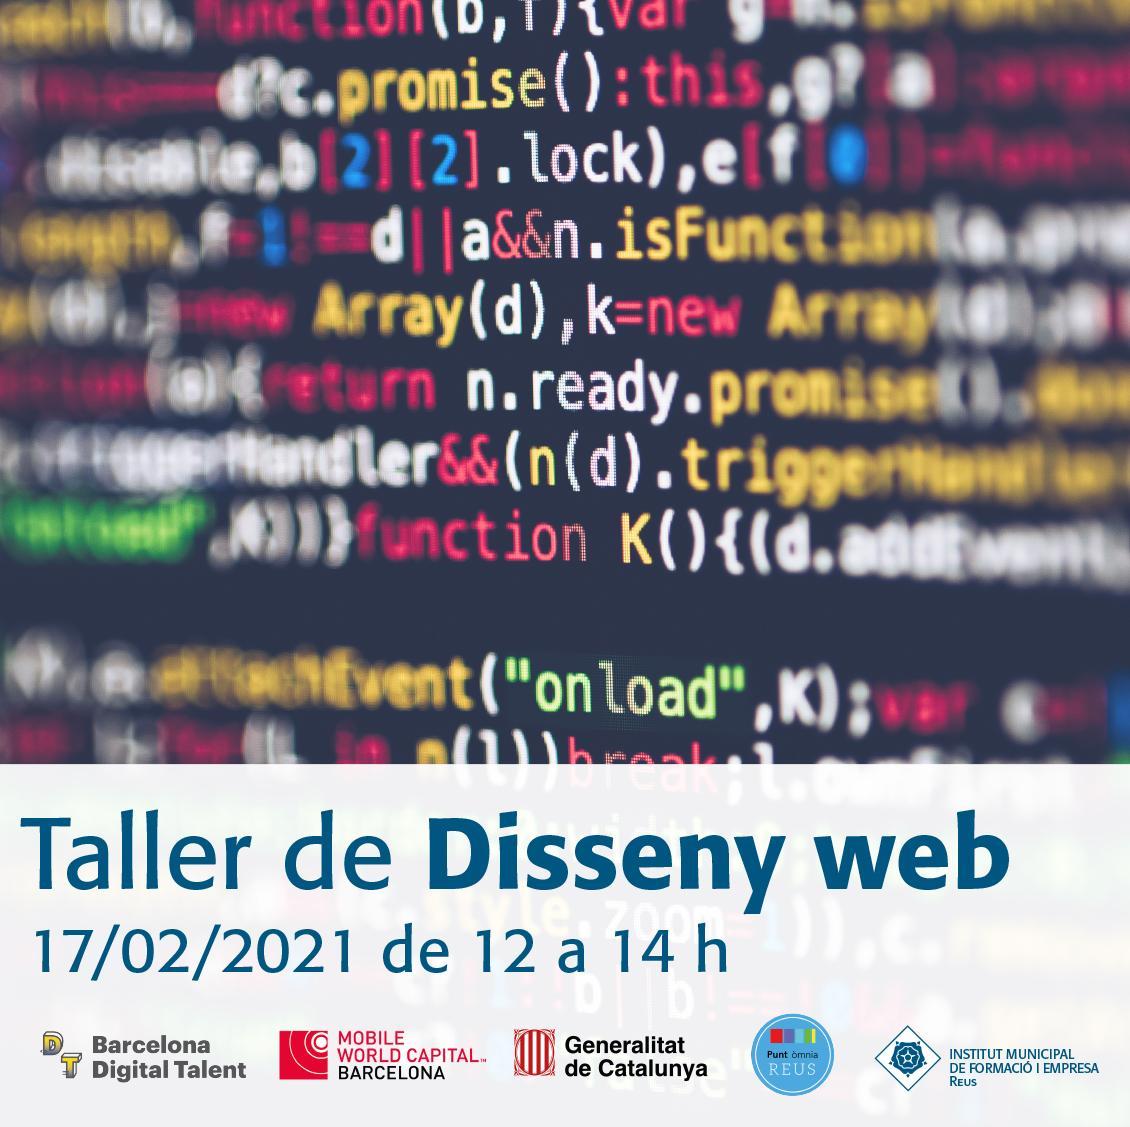 Taller de disseny web